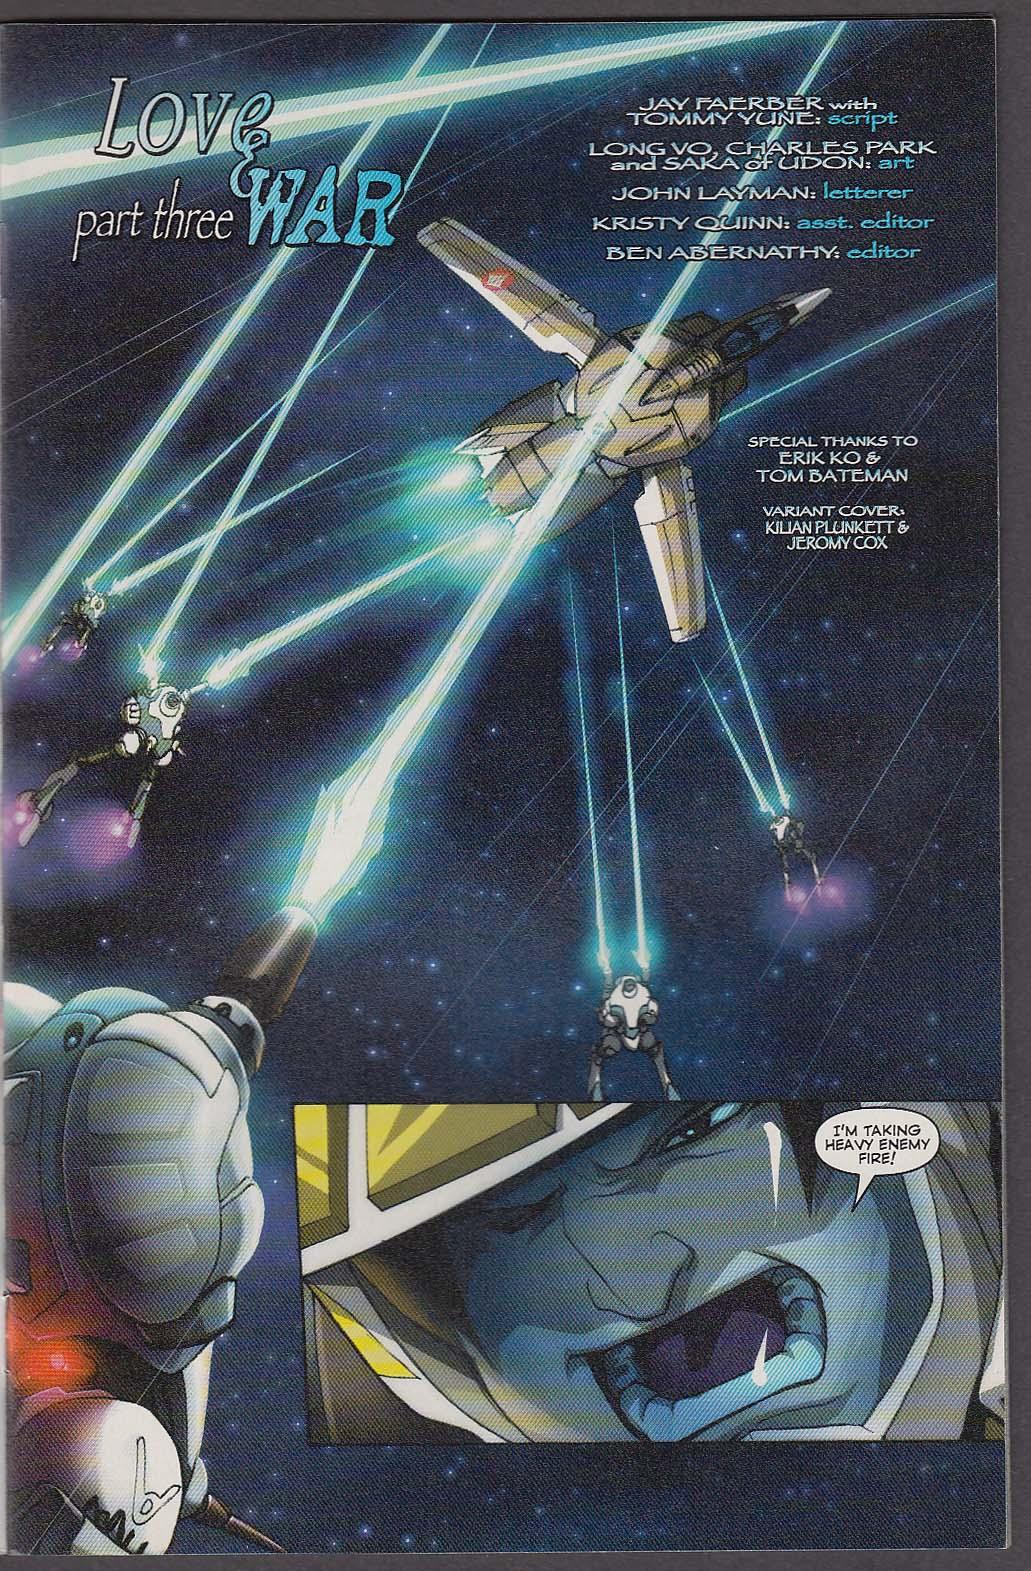 Image for ROBOTECH LOVE & WAR #3 WildStorm comic book 10 2003